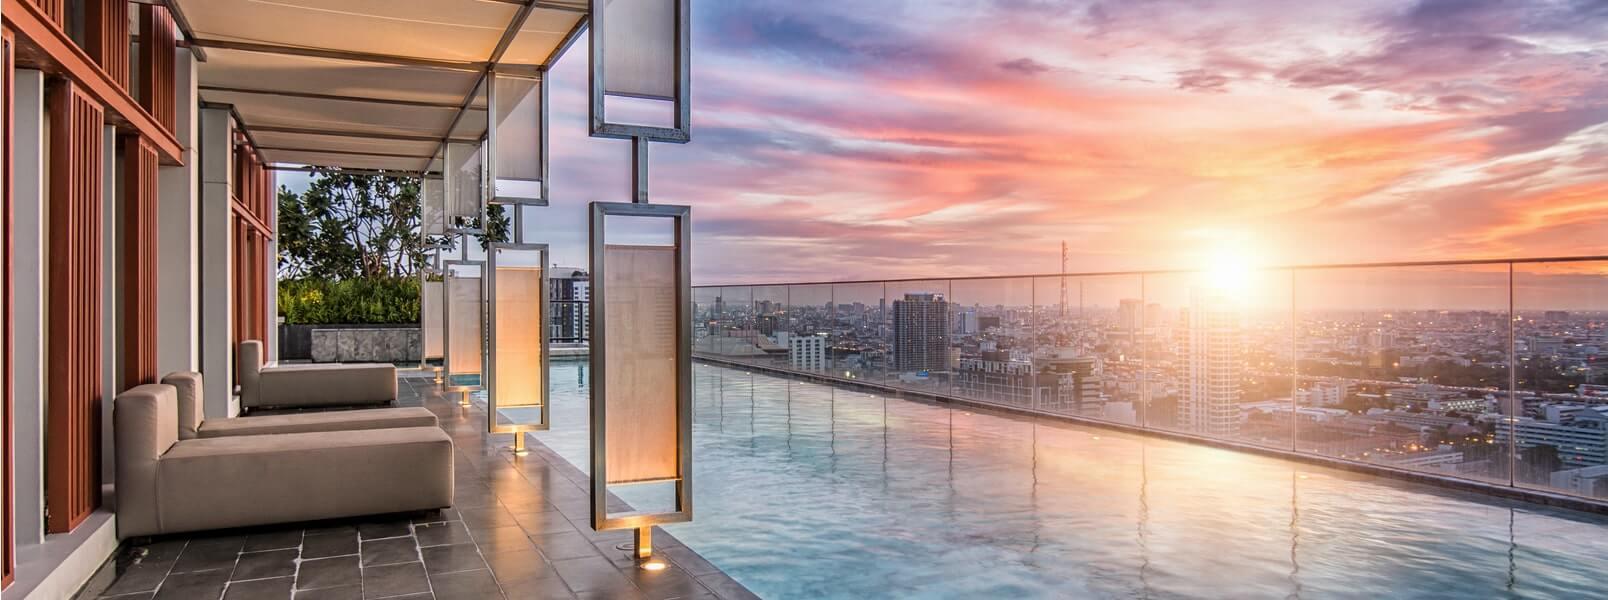 4 Rooftop Terraces to Inspire Your Outdoor Haven